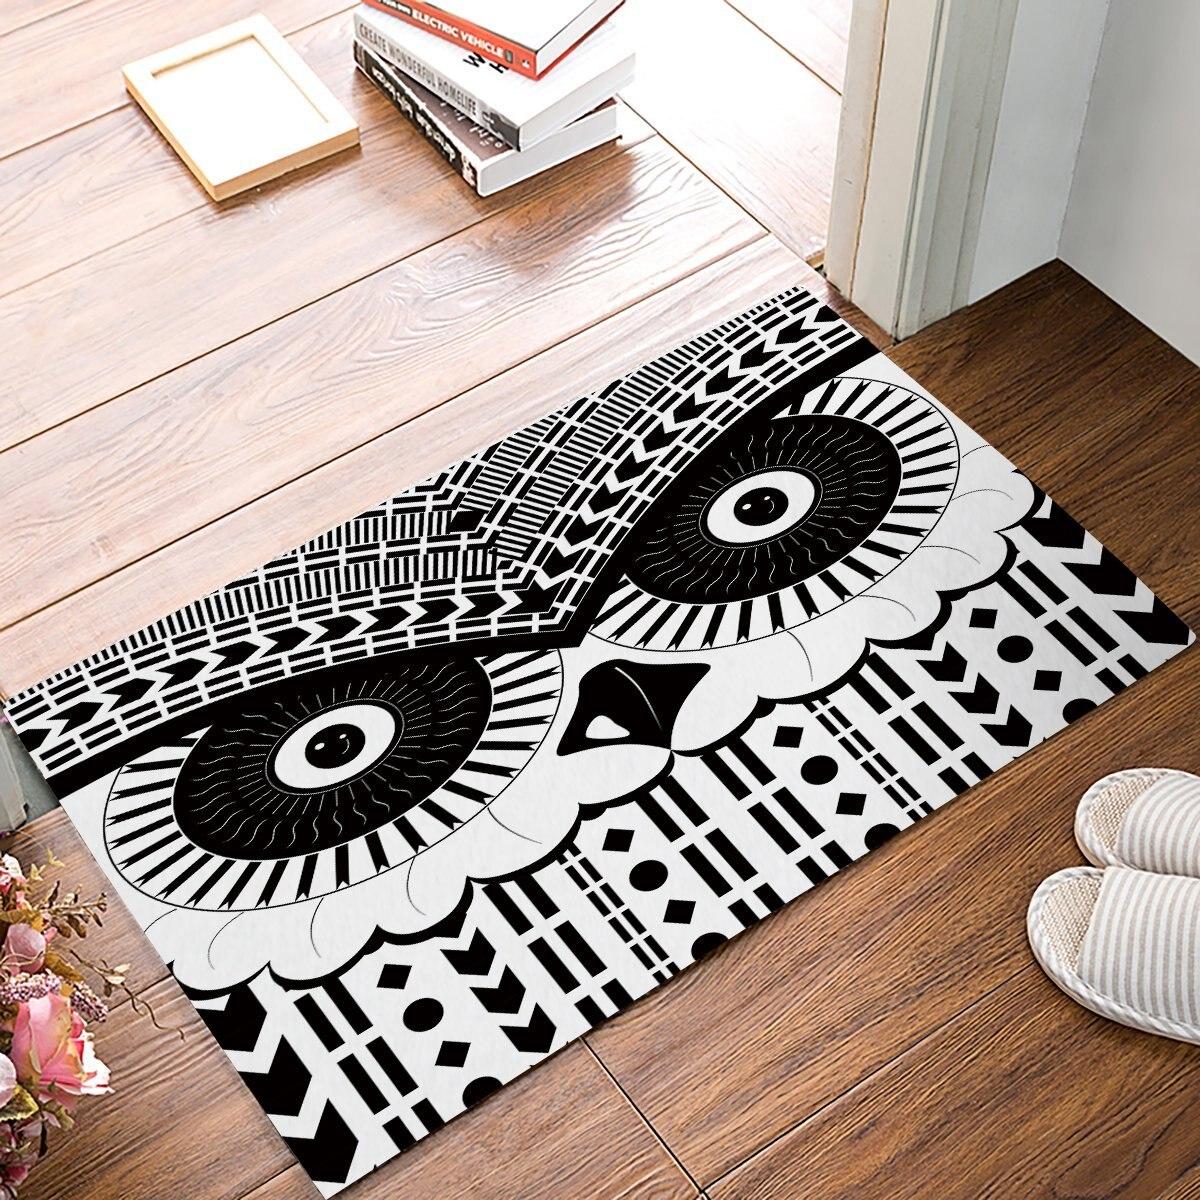 Black And White Geometric Kitchen Rug: Black And White Geometric Owl Door Mats Kitchen Floor Bath